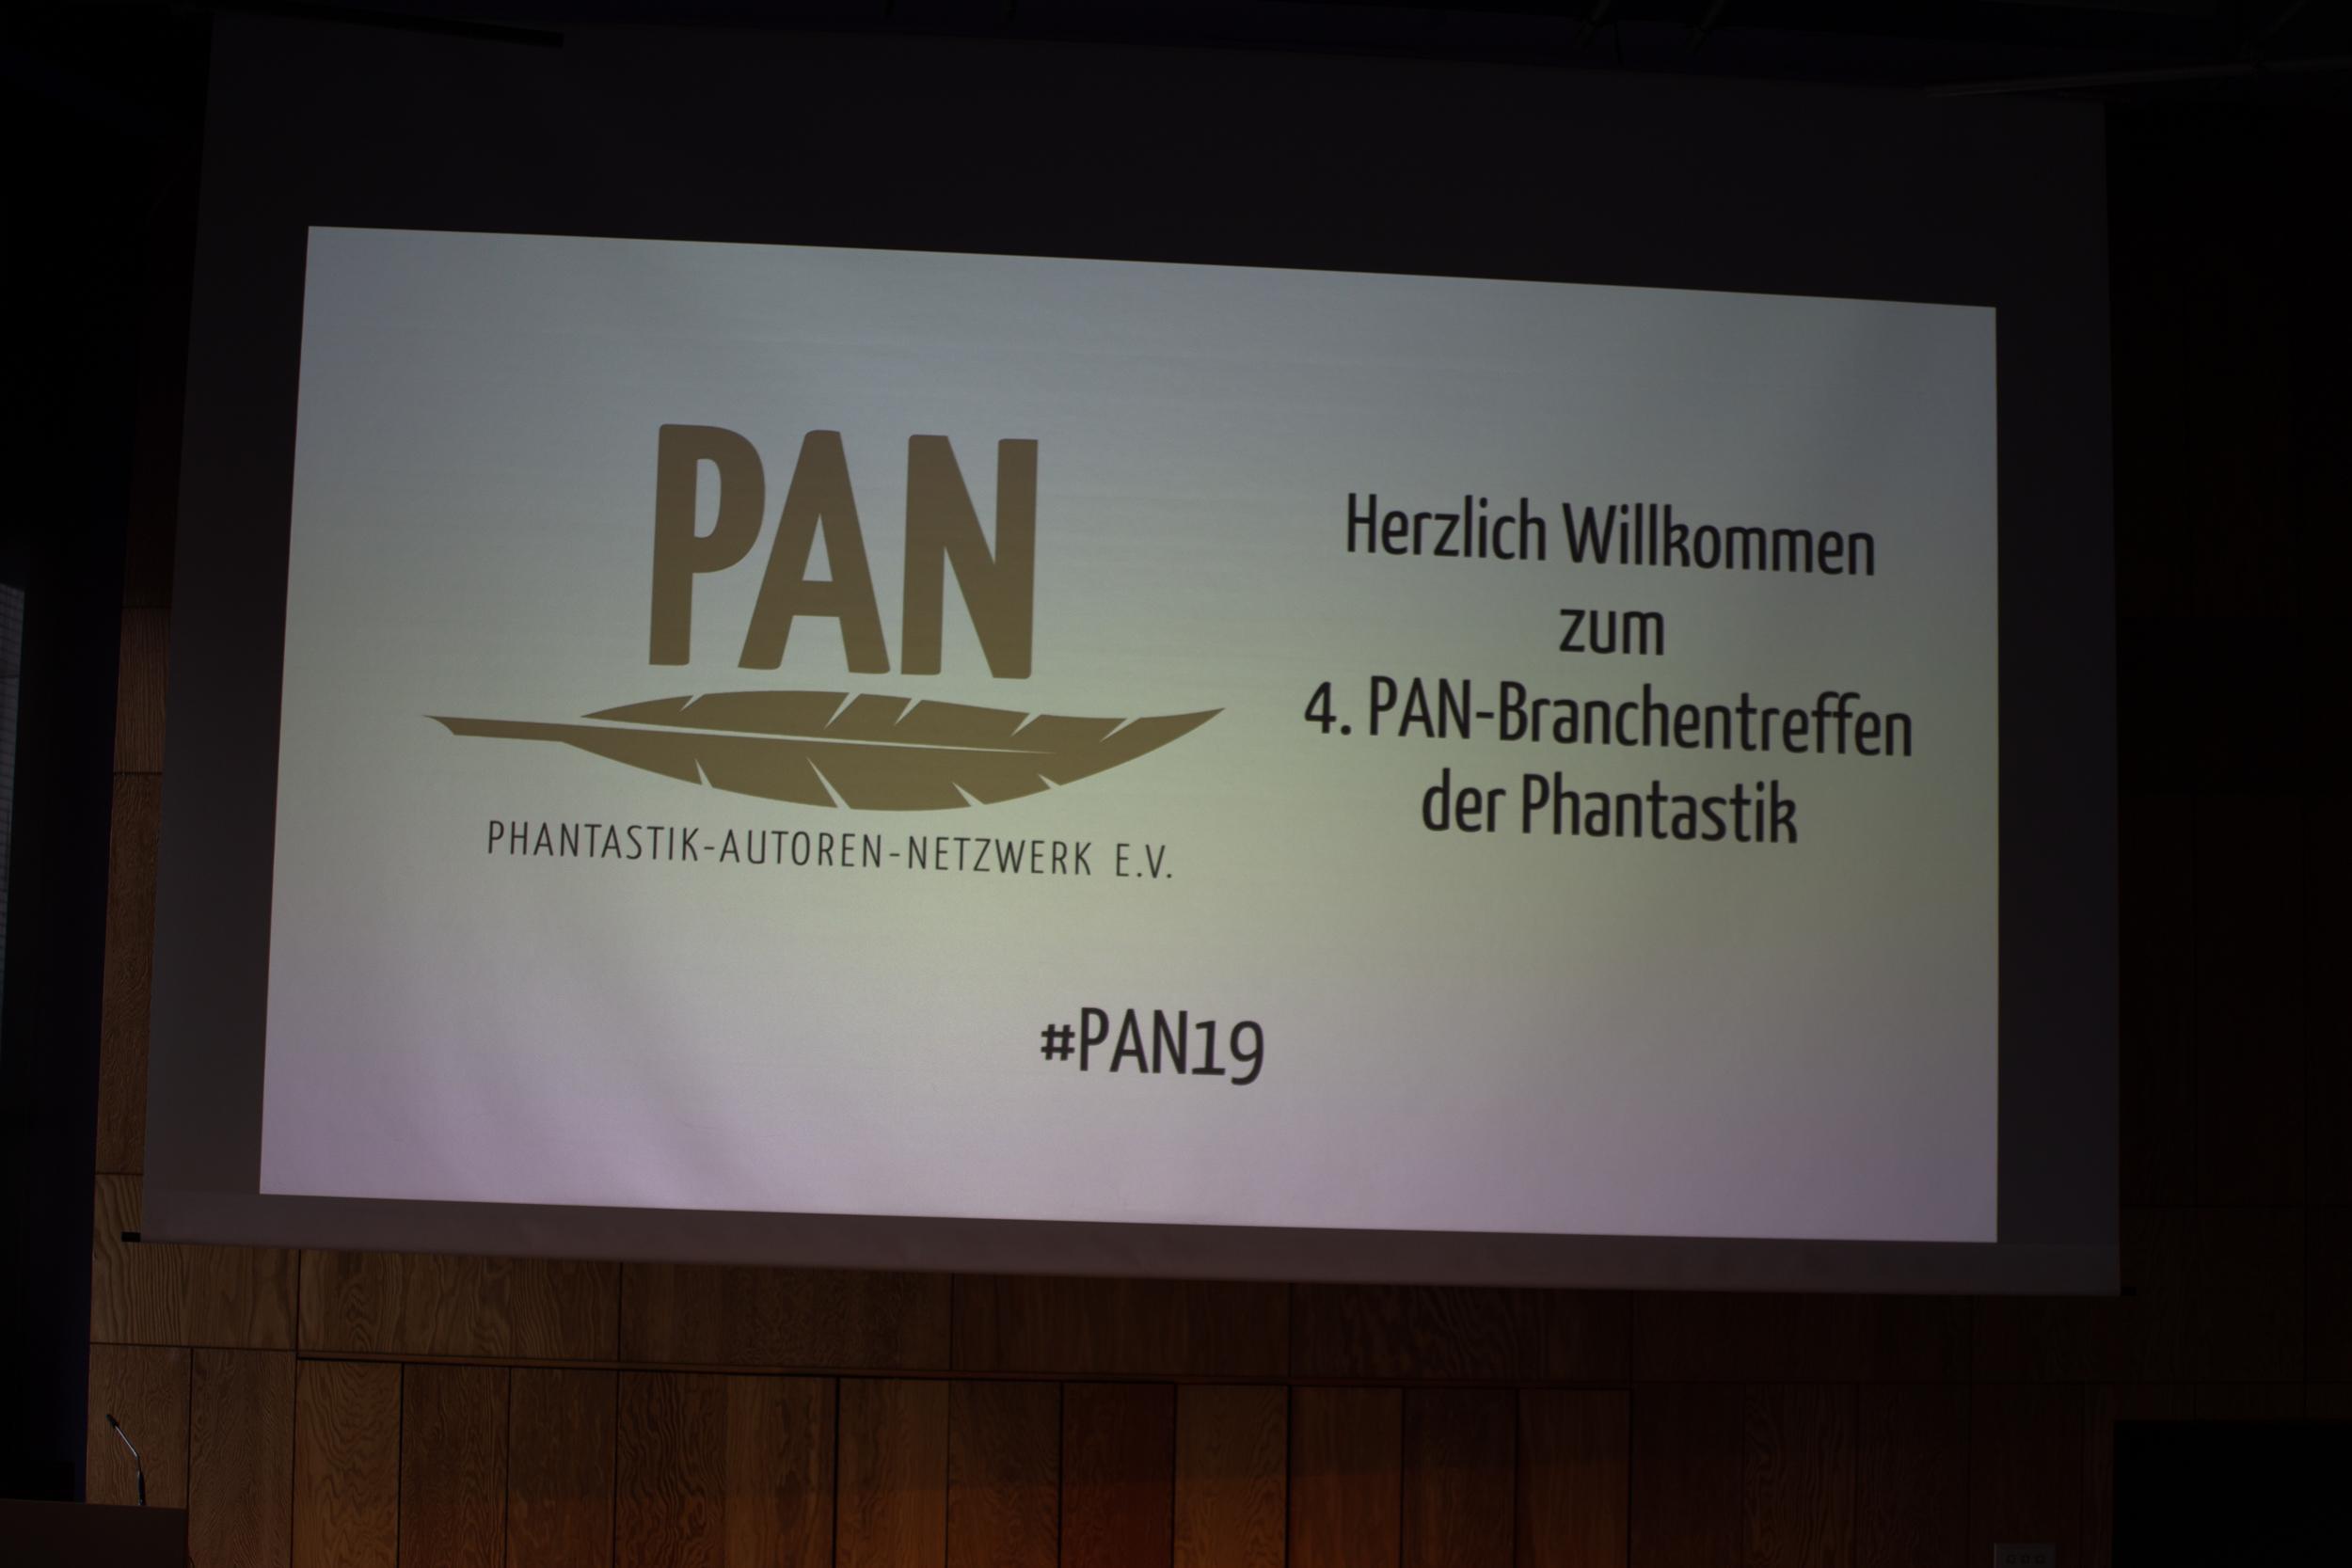 PAN-Privat-6790.jpg